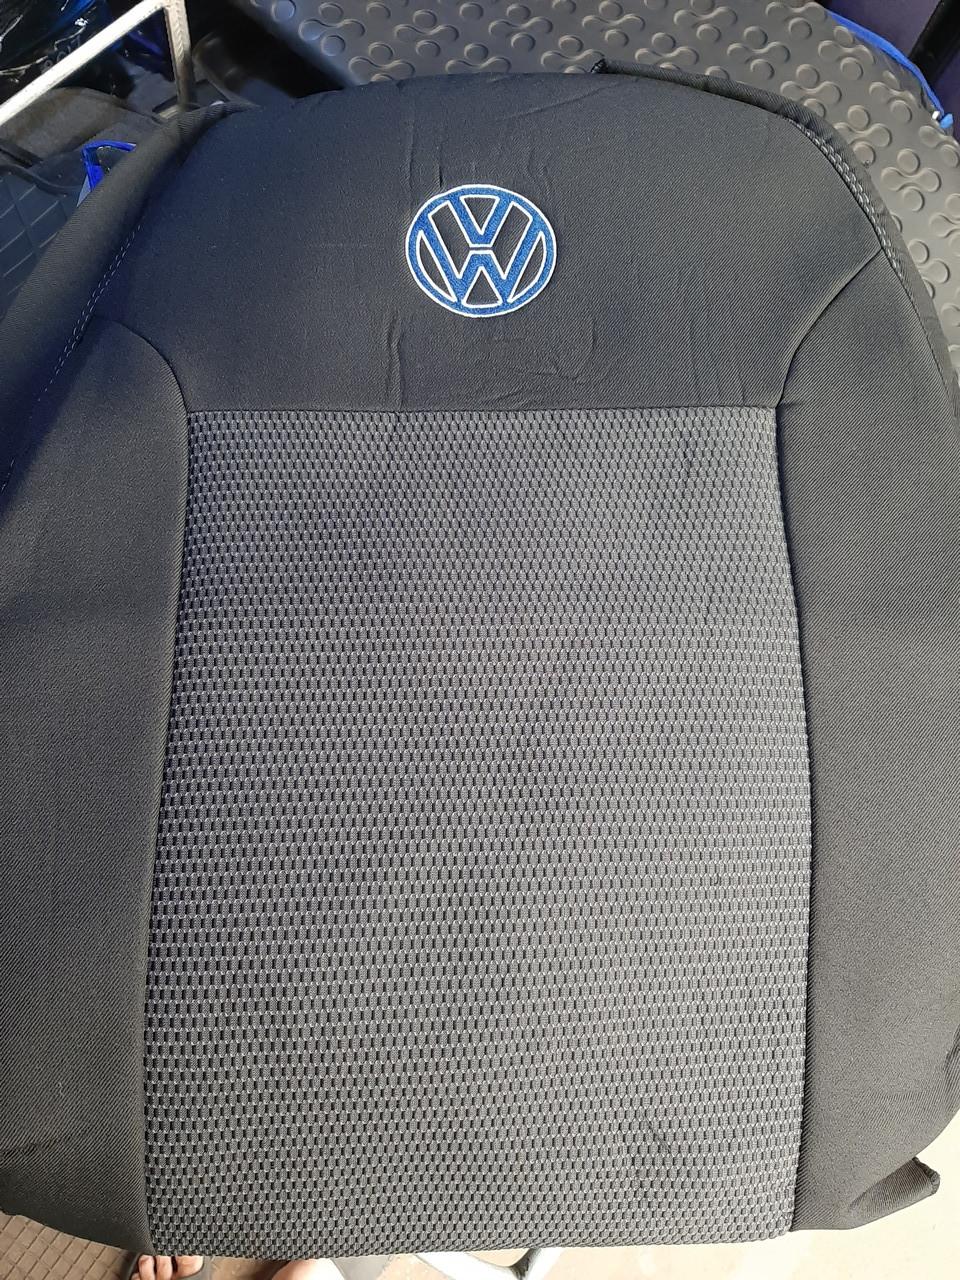 "Чехлы на Volkswagen T6 Transporter Van (9 мест) 2016- / авто чехлы Фольксваген Т6 ""EMC Elegant"""